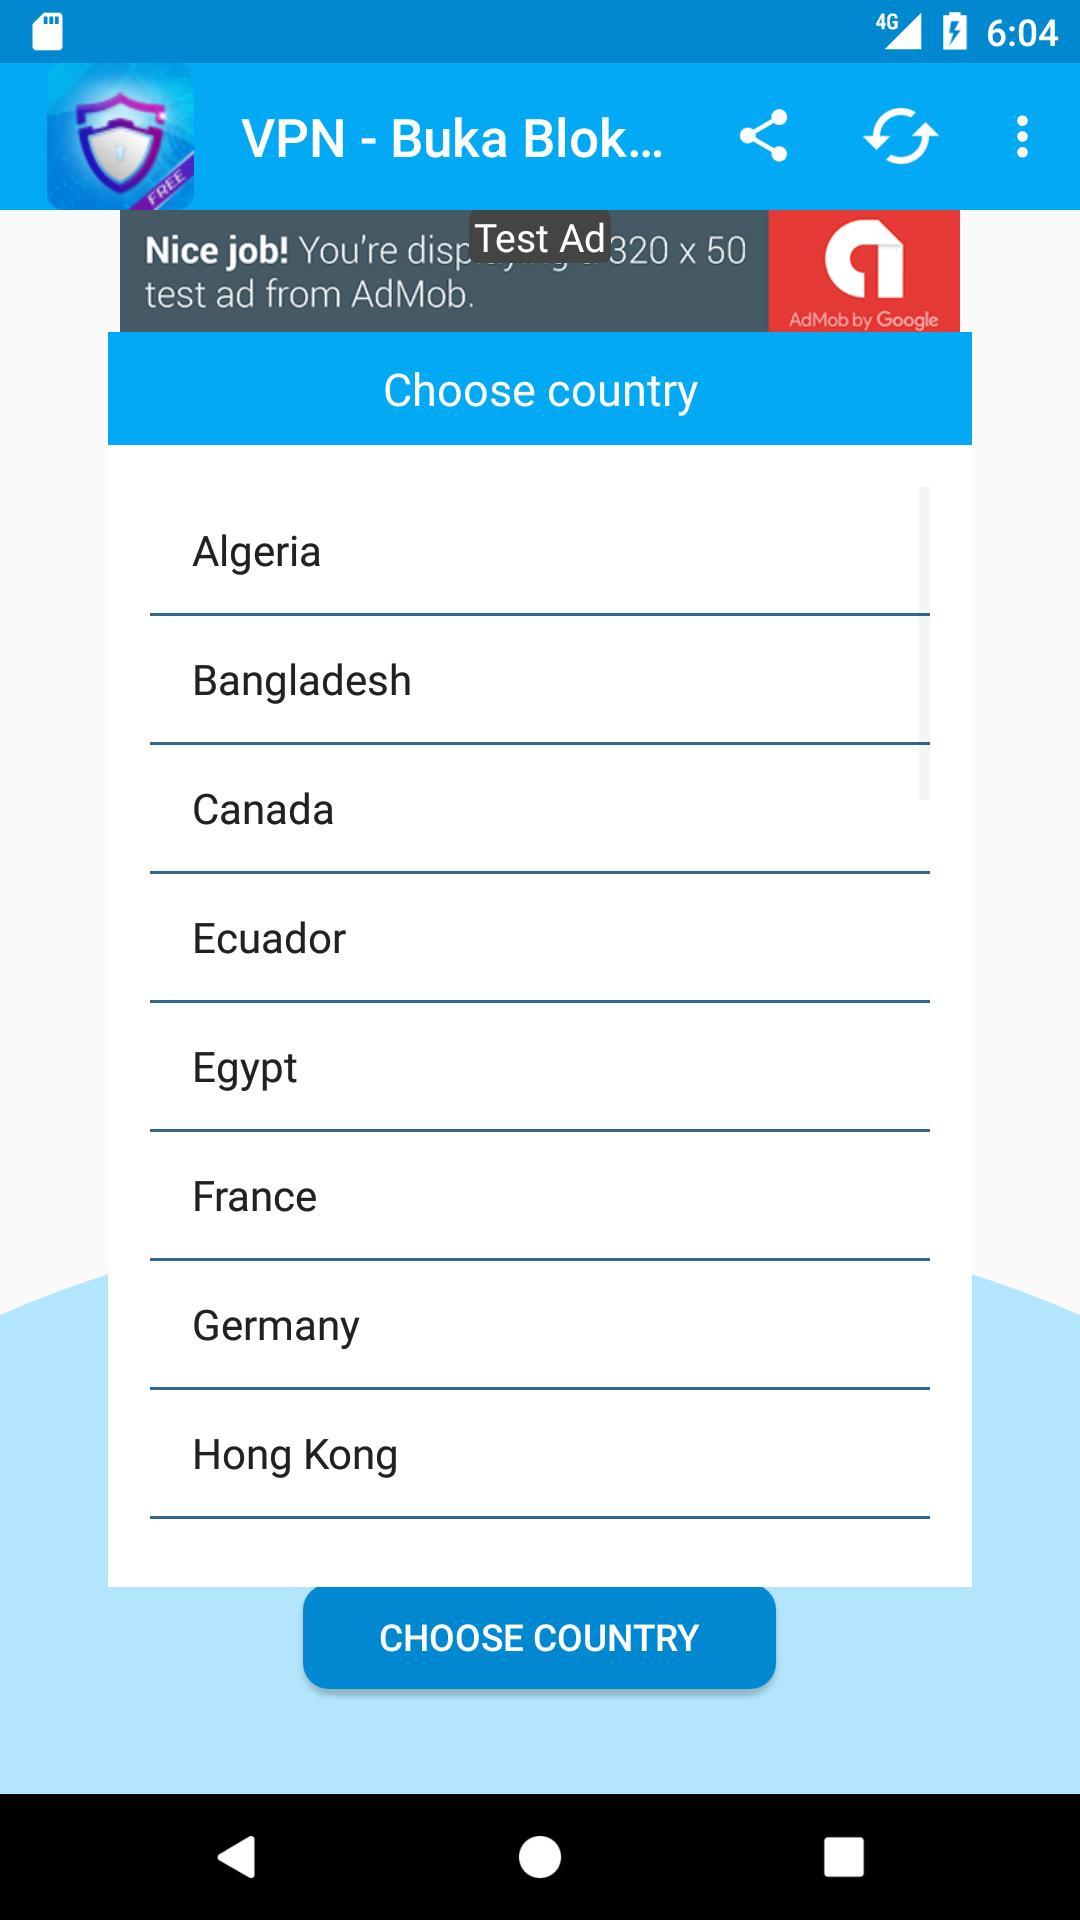 VPN Buka Blokir Situs Bokep Pro for Android - APK Download